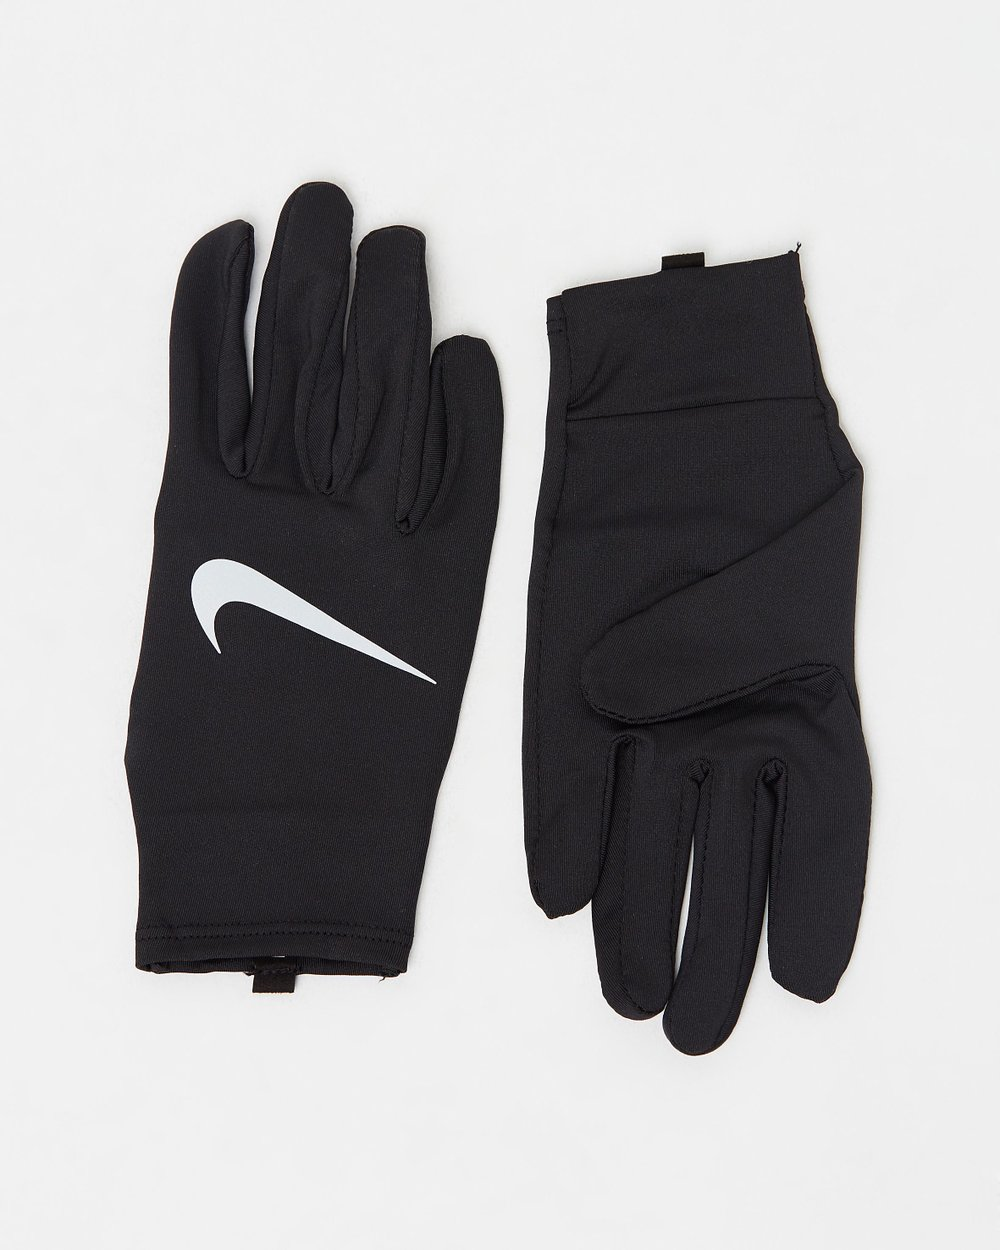 a1d5f7792ce3 Miler Running Gloves - Unisex by Nike Online